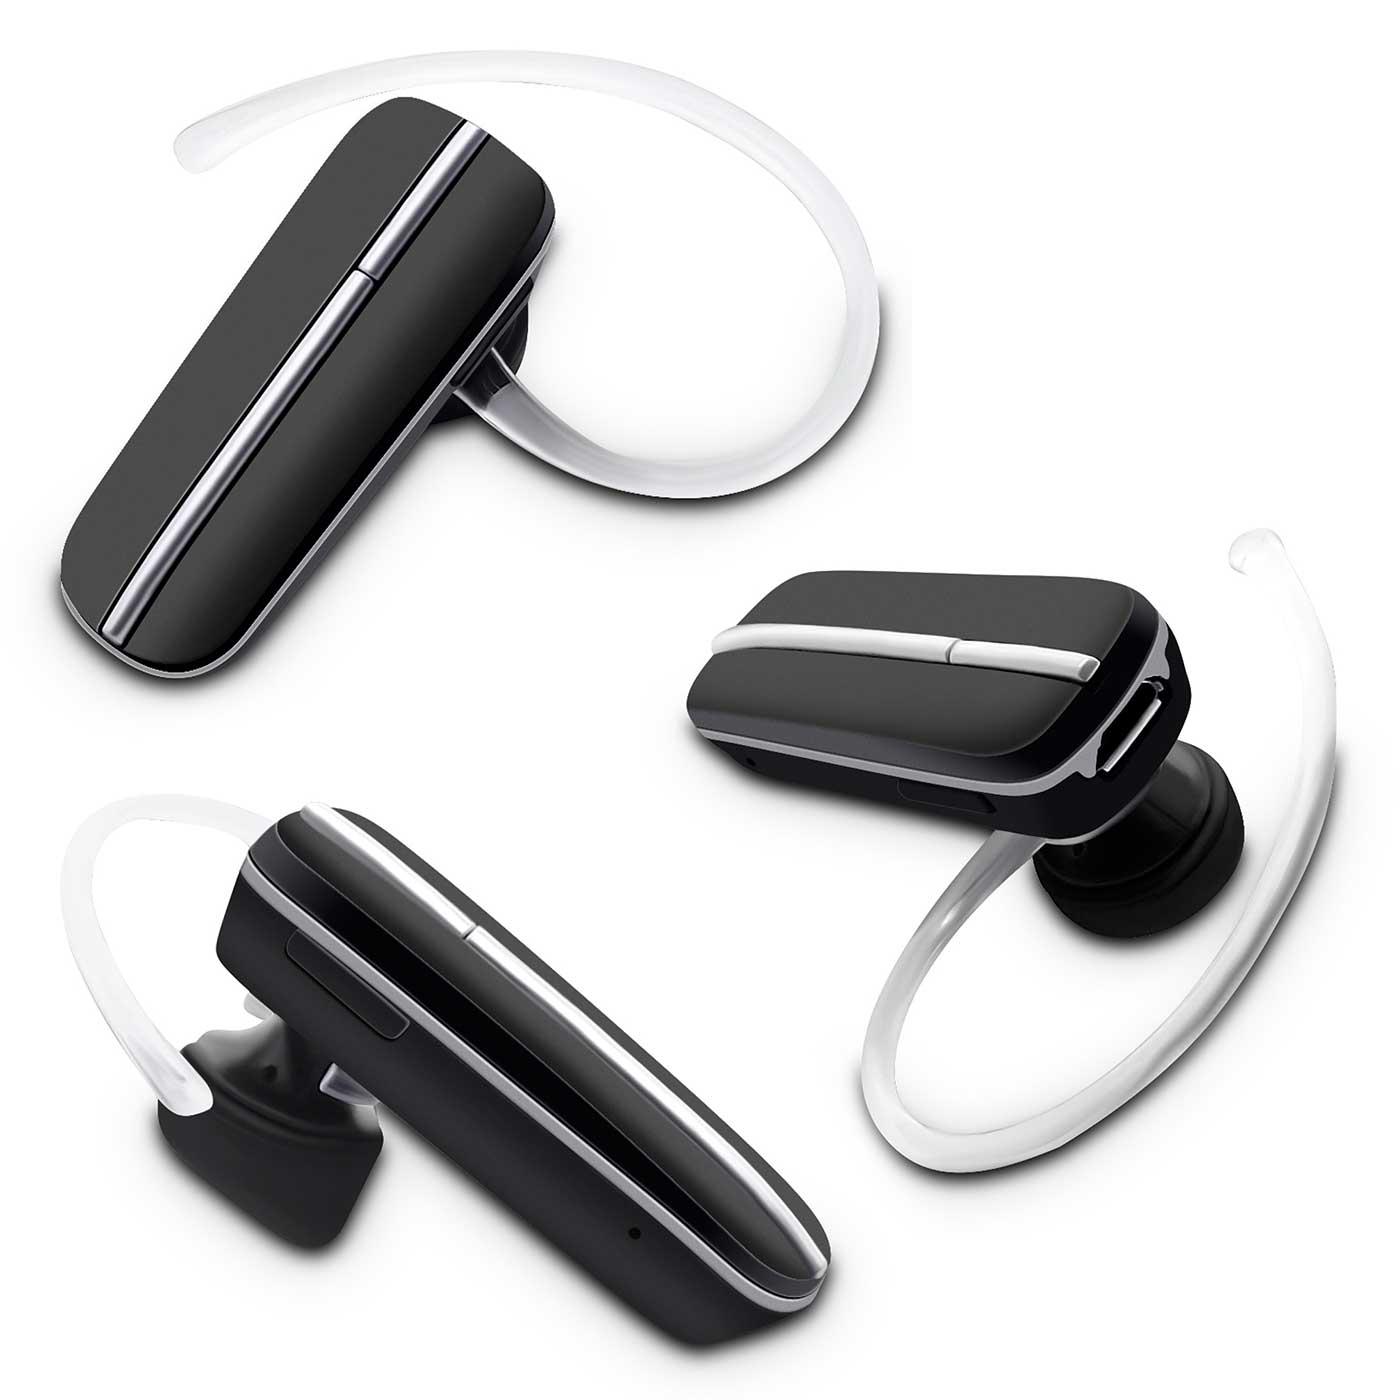 neu drahtlos stereo bluetooth 3 0 kopfh rer headset f r. Black Bedroom Furniture Sets. Home Design Ideas